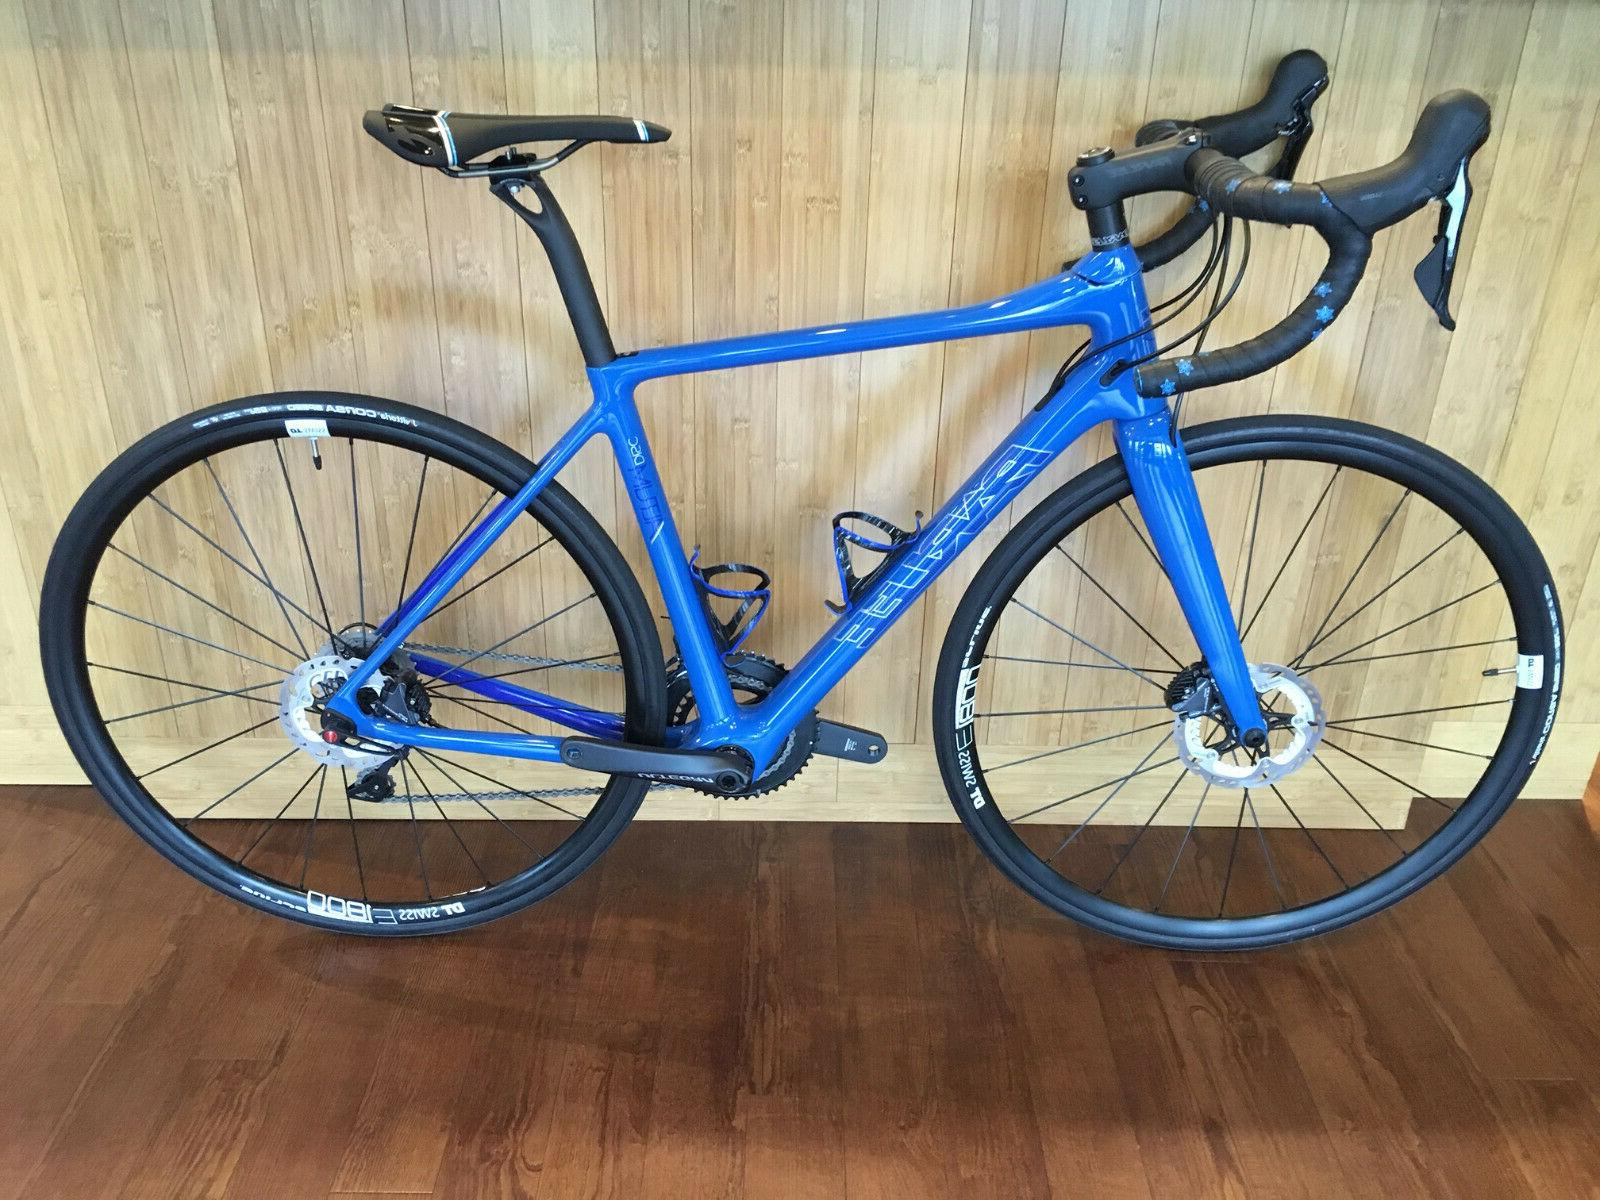 Parlee Altum Road Blue Ultegra 8000 Small Demo Upgrades